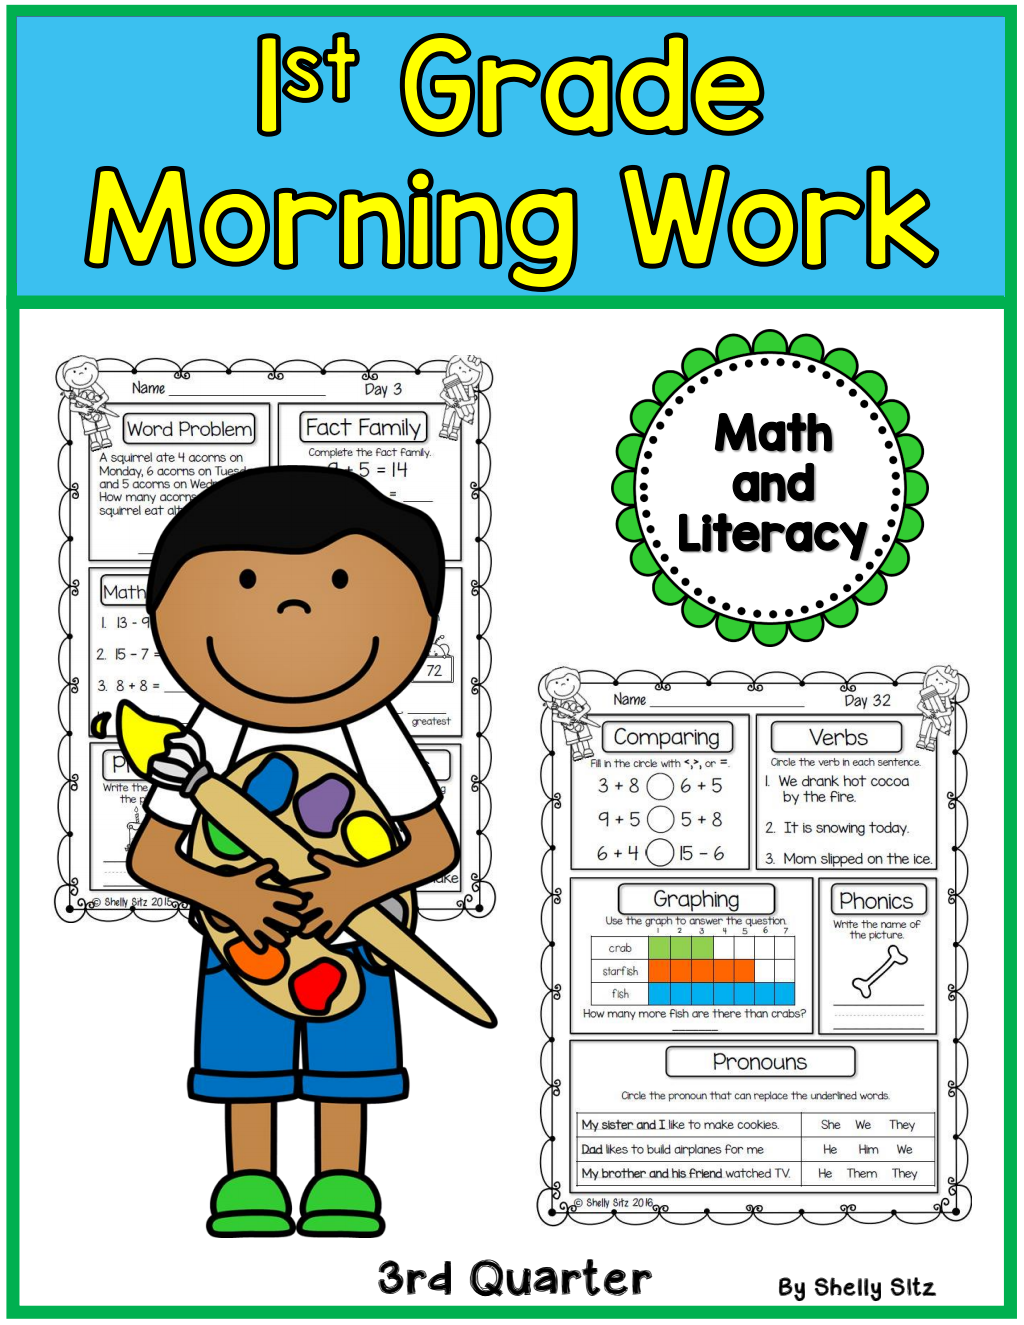 First Grade Morning Work 3rd Quarter Preview